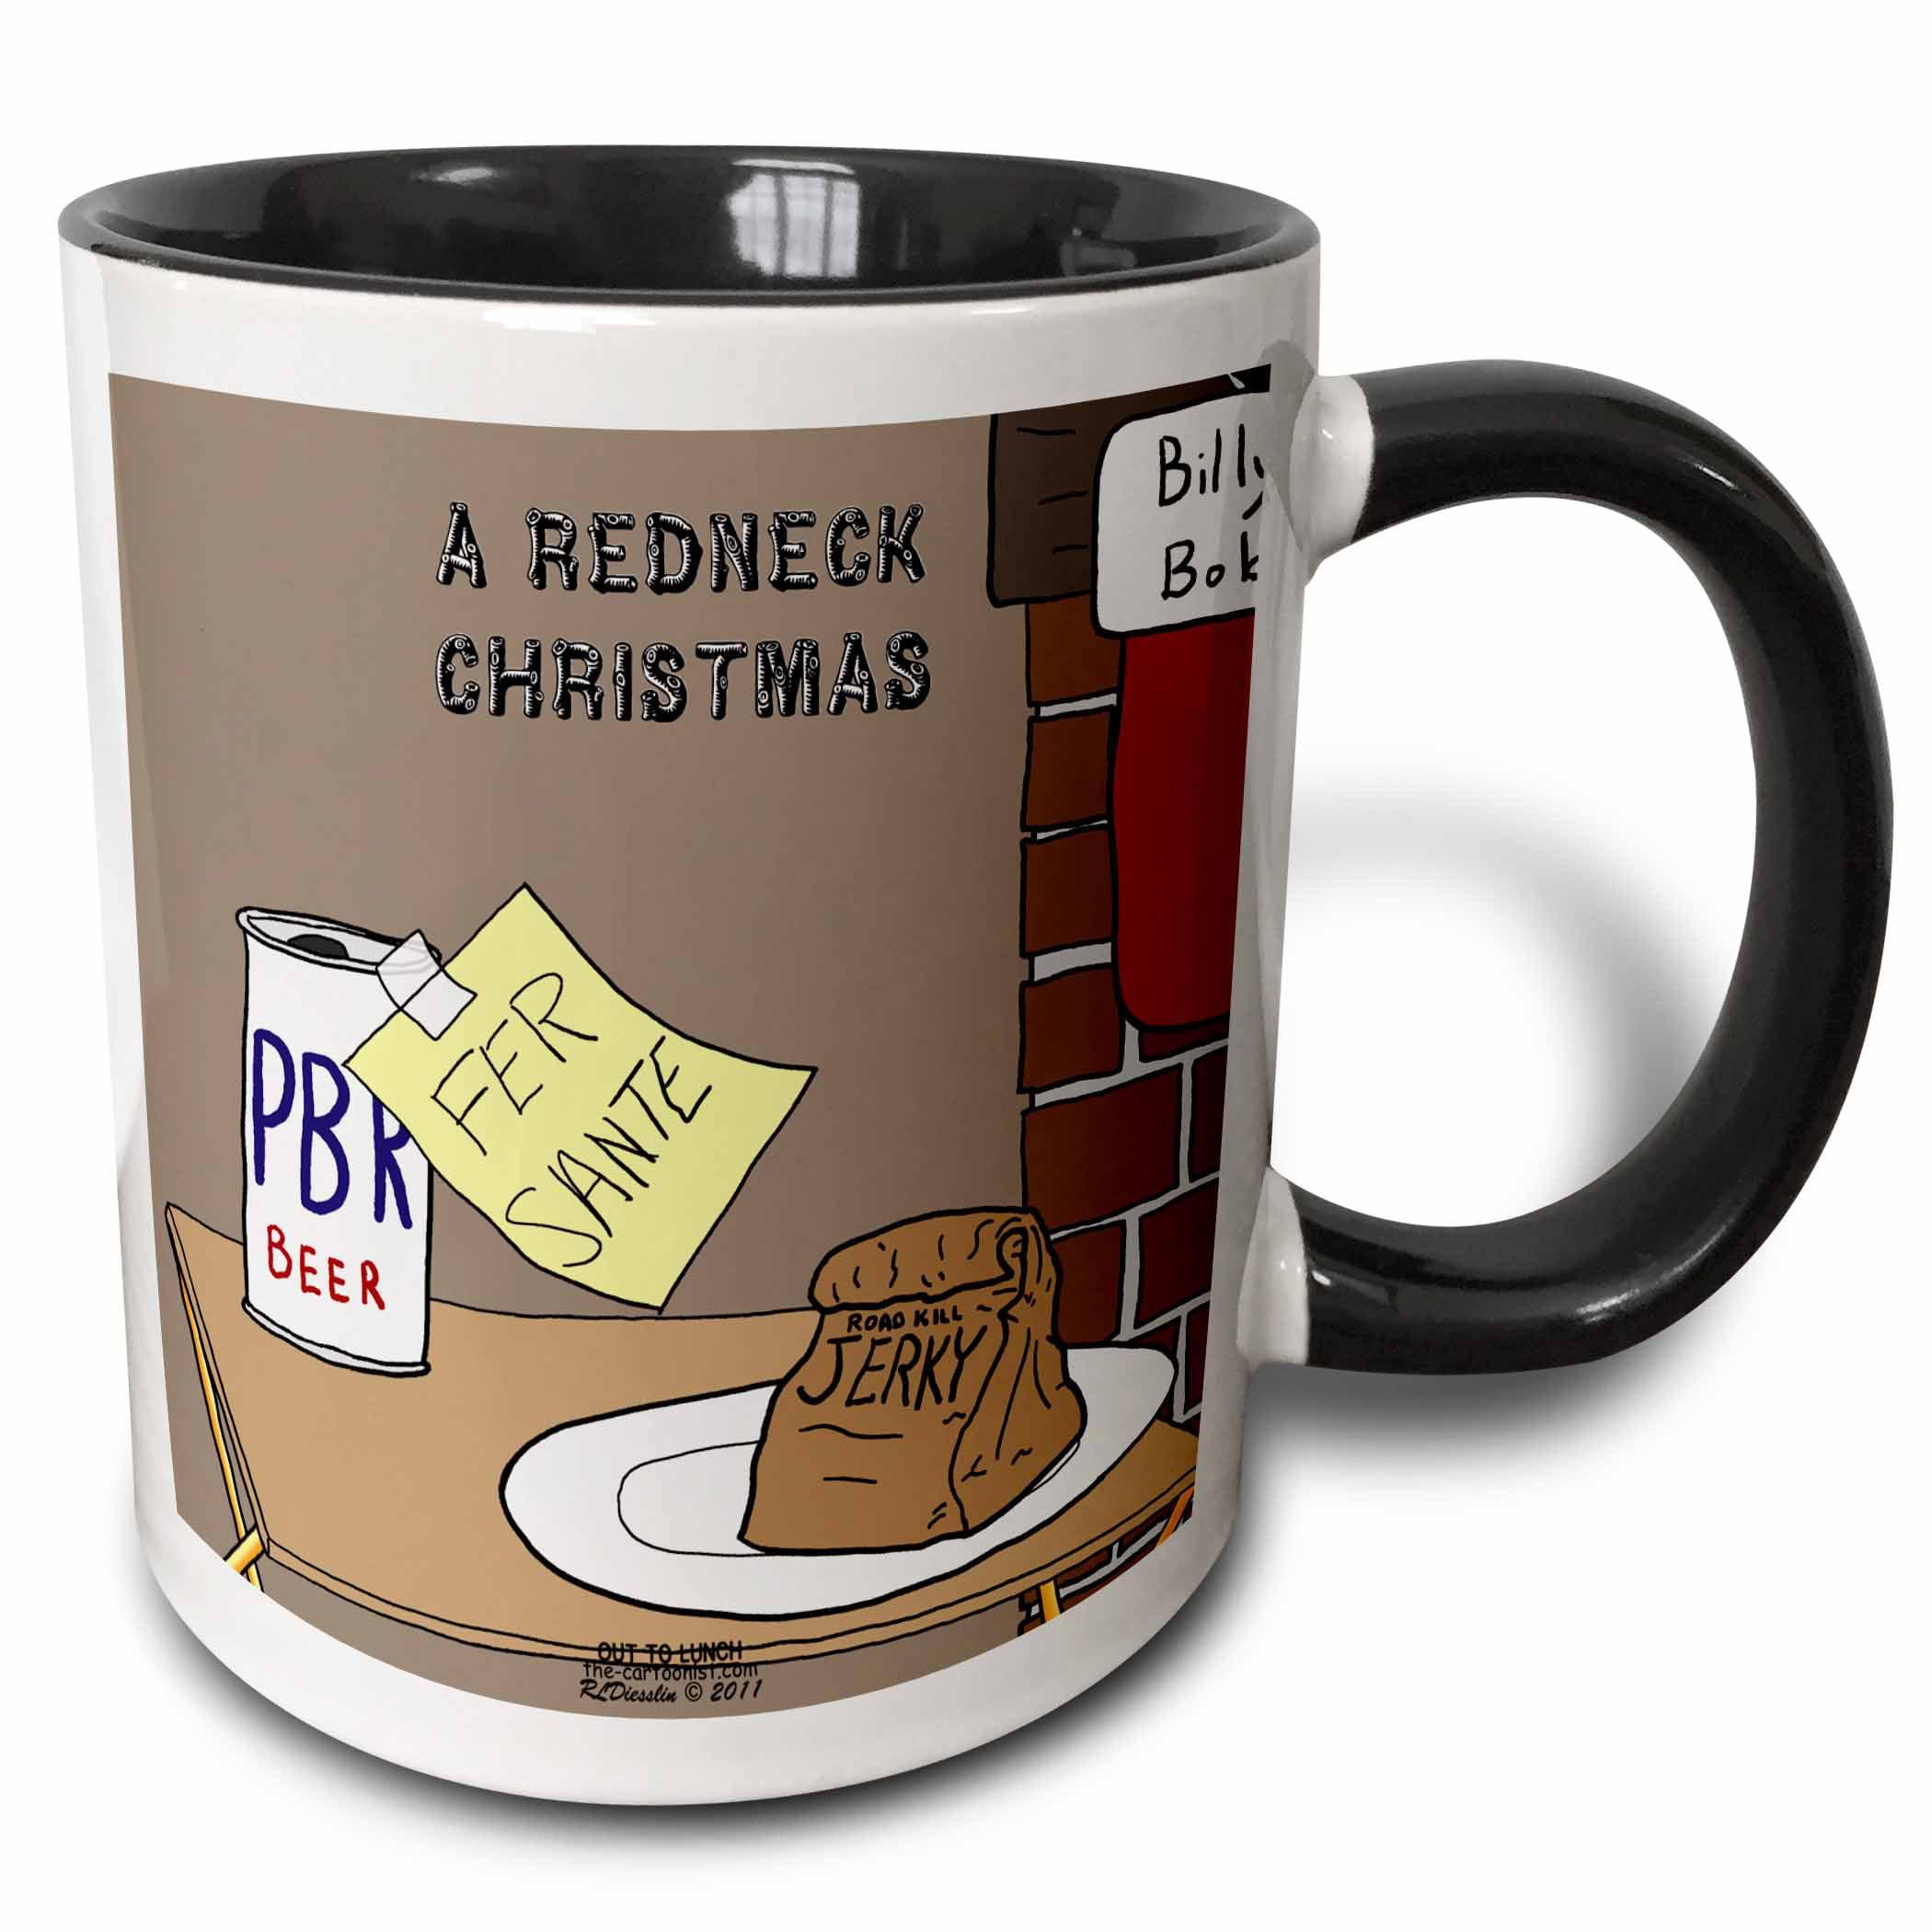 3dRose A redneck christmas eve Santa snack including beer and jerky, Two Tone Black Mug, 11oz